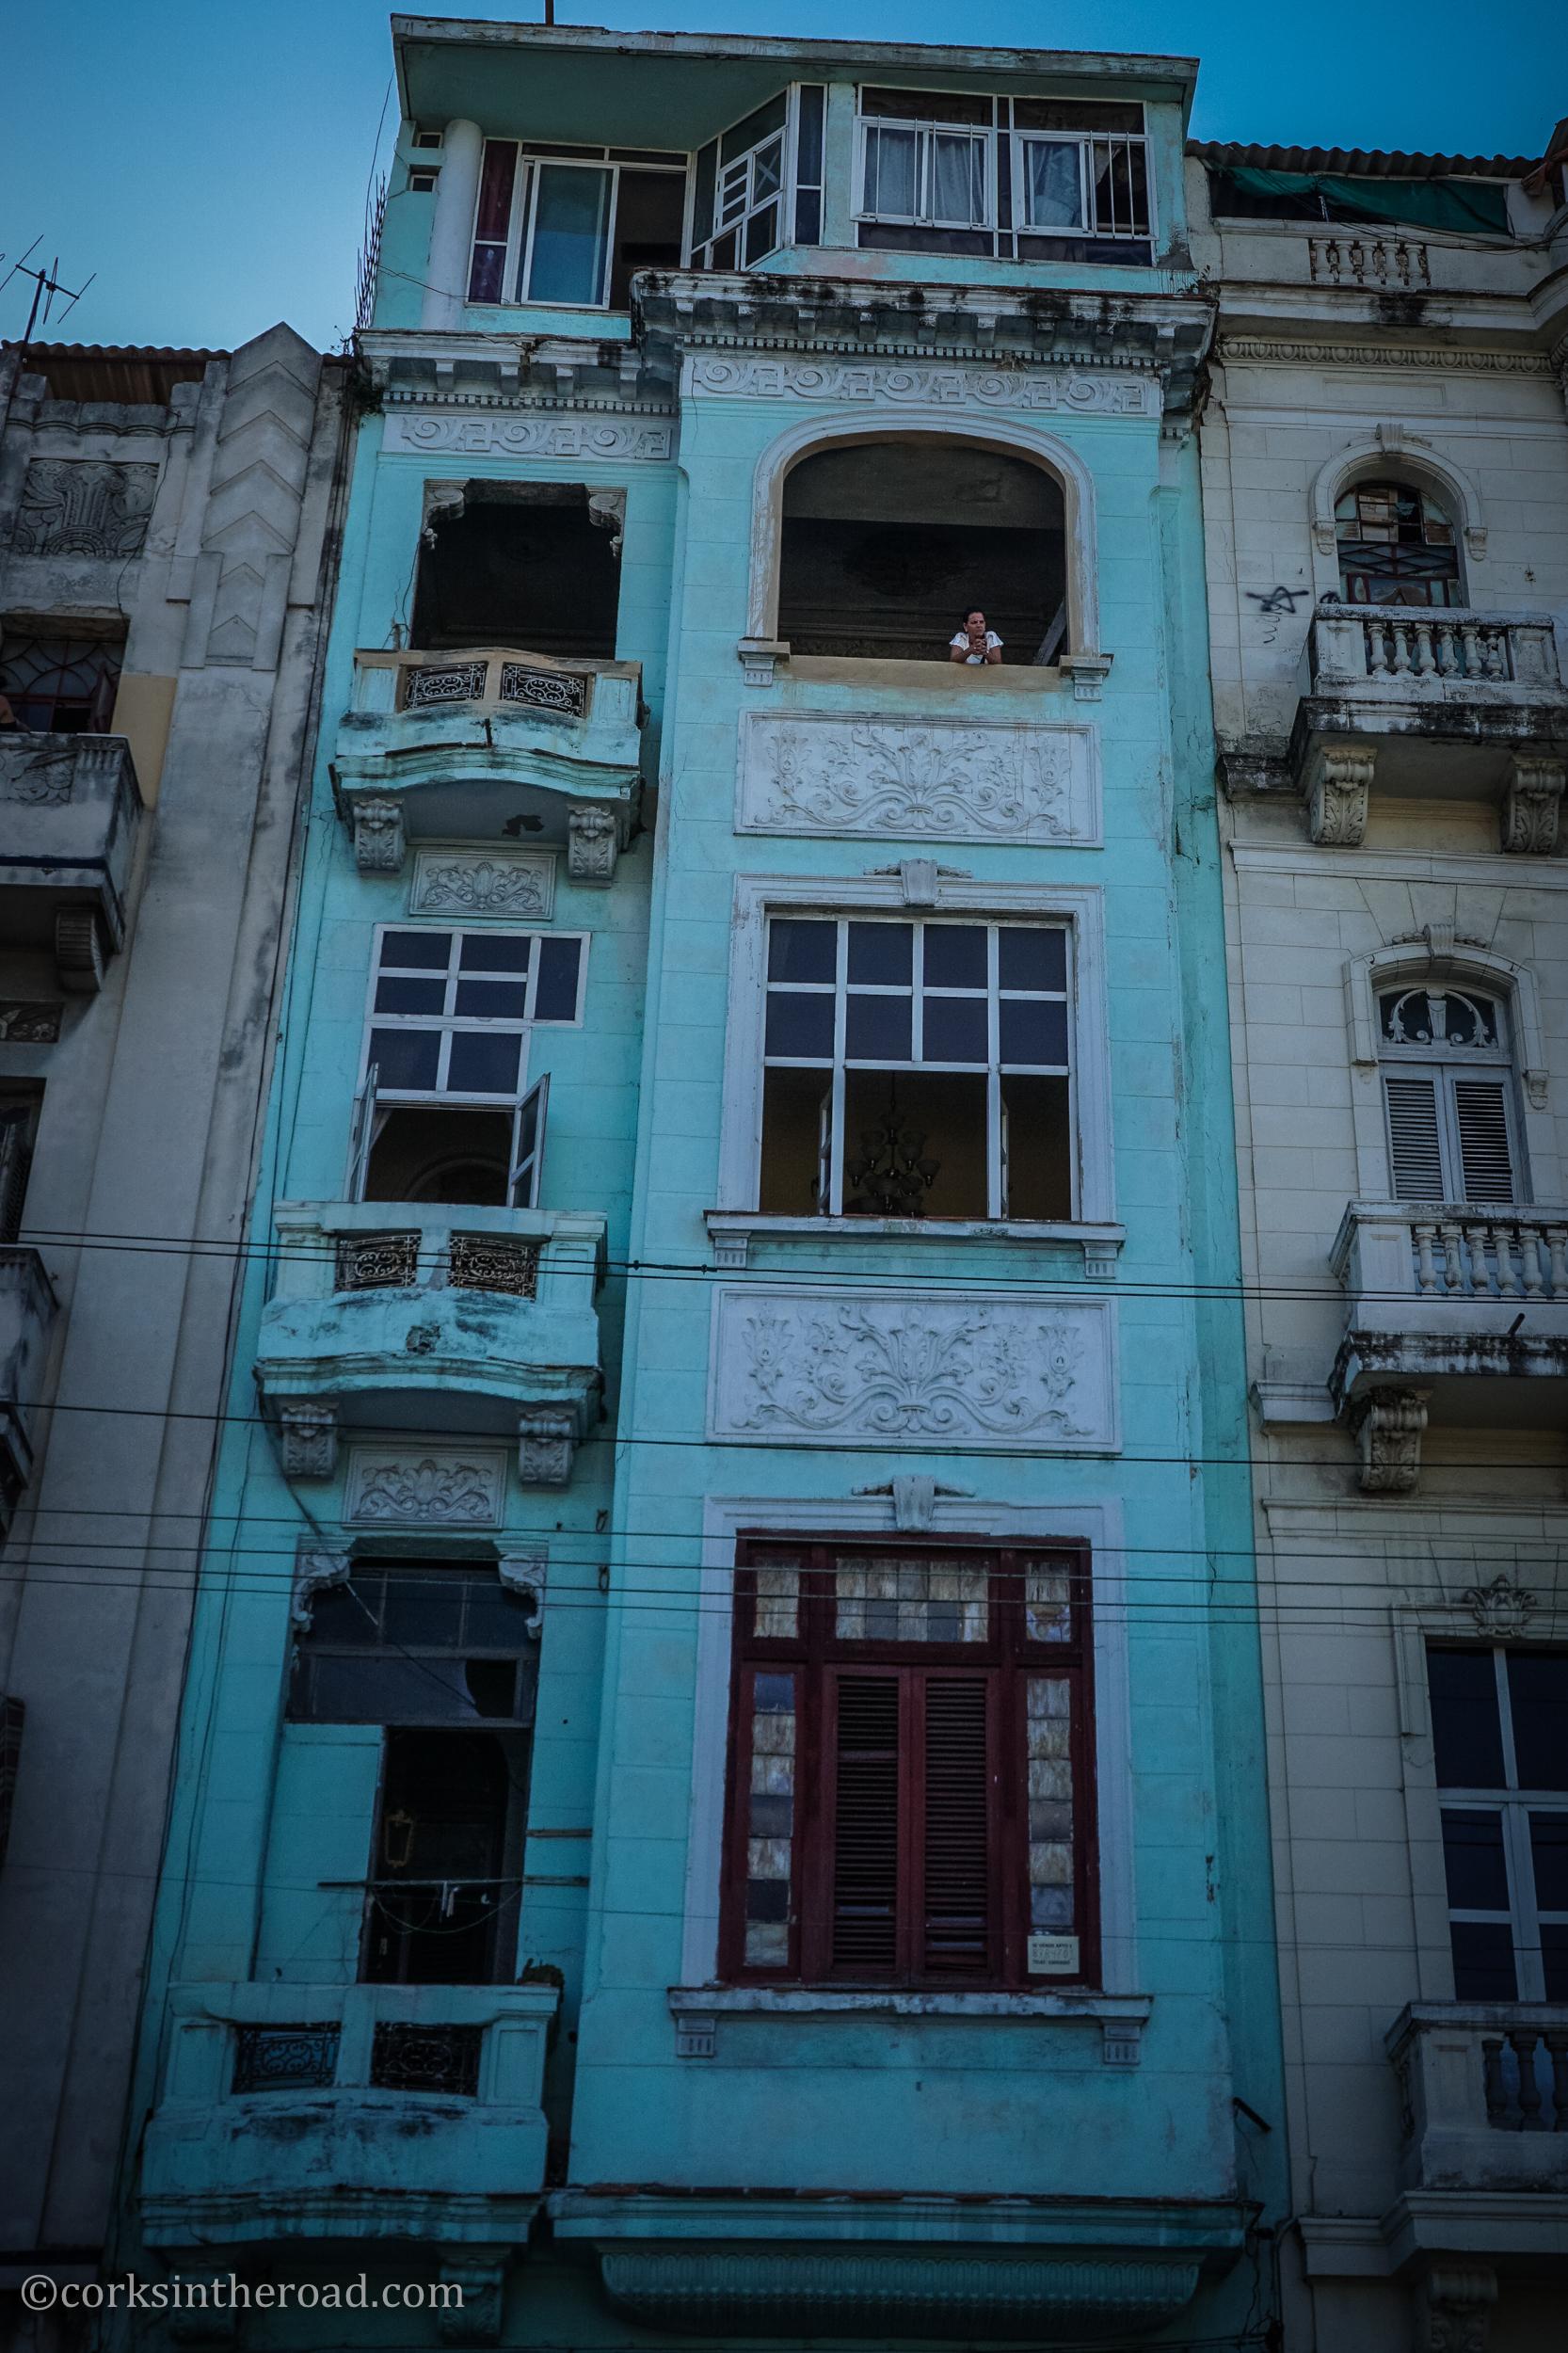 Architecture, Corksintheroad, Cuba, Havana-15.jpg